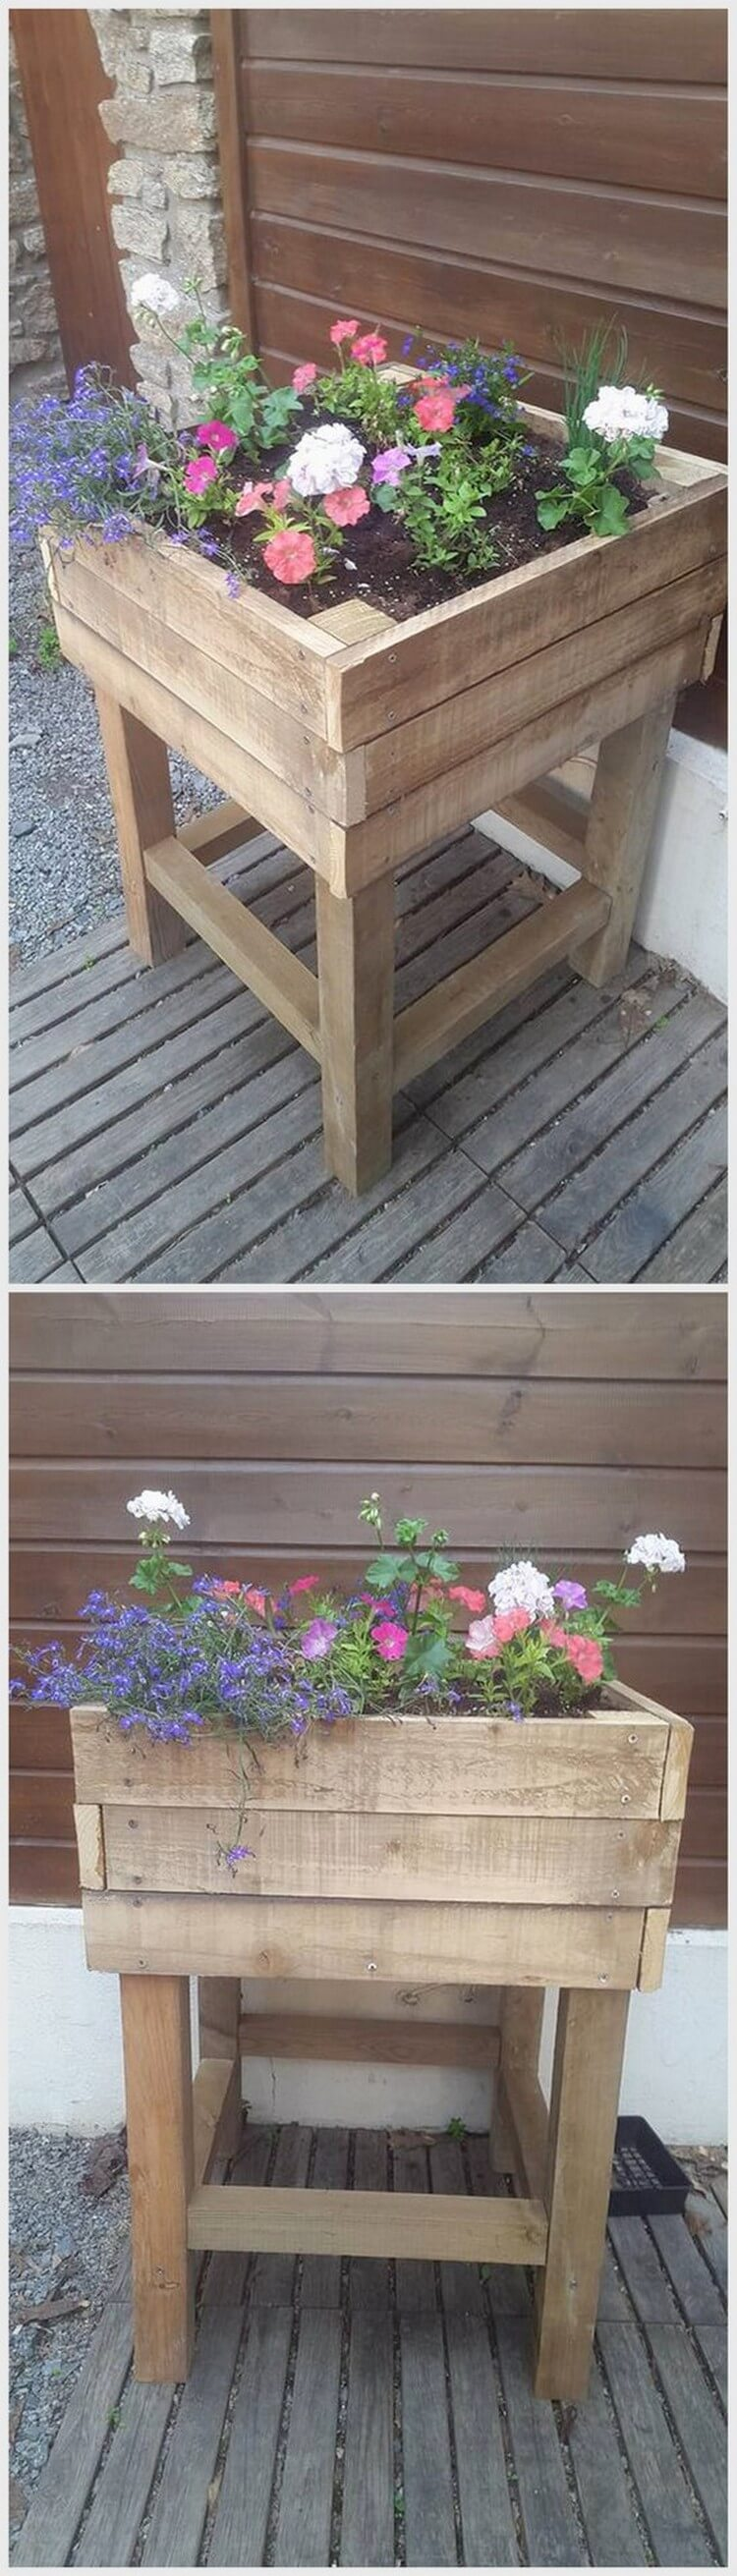 Genius Ideas for Wooden Pallet Recreations | Pallet Wood ...